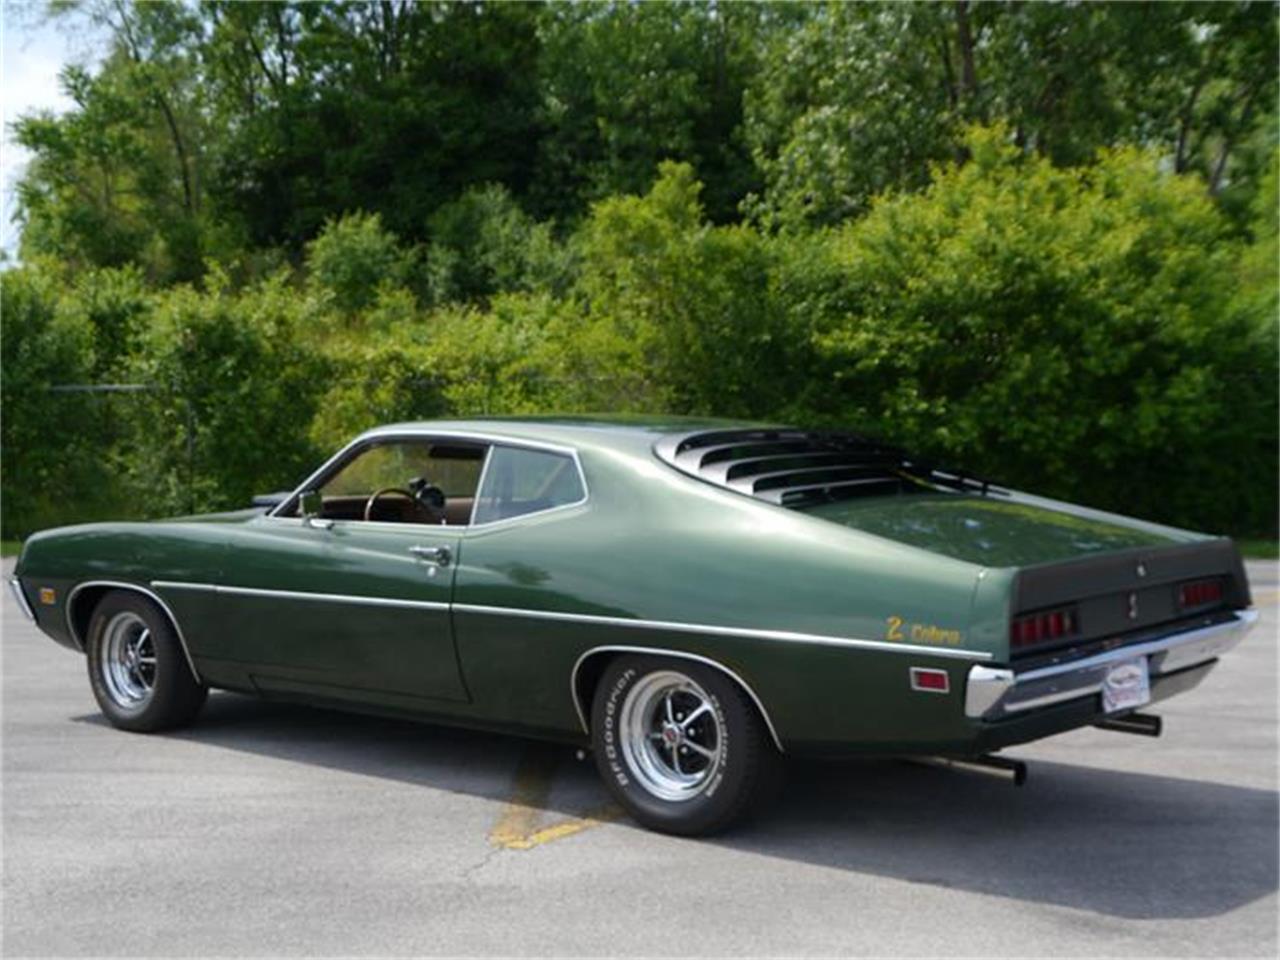 photo 3 - 1971 Ford Gran Torino Cobra